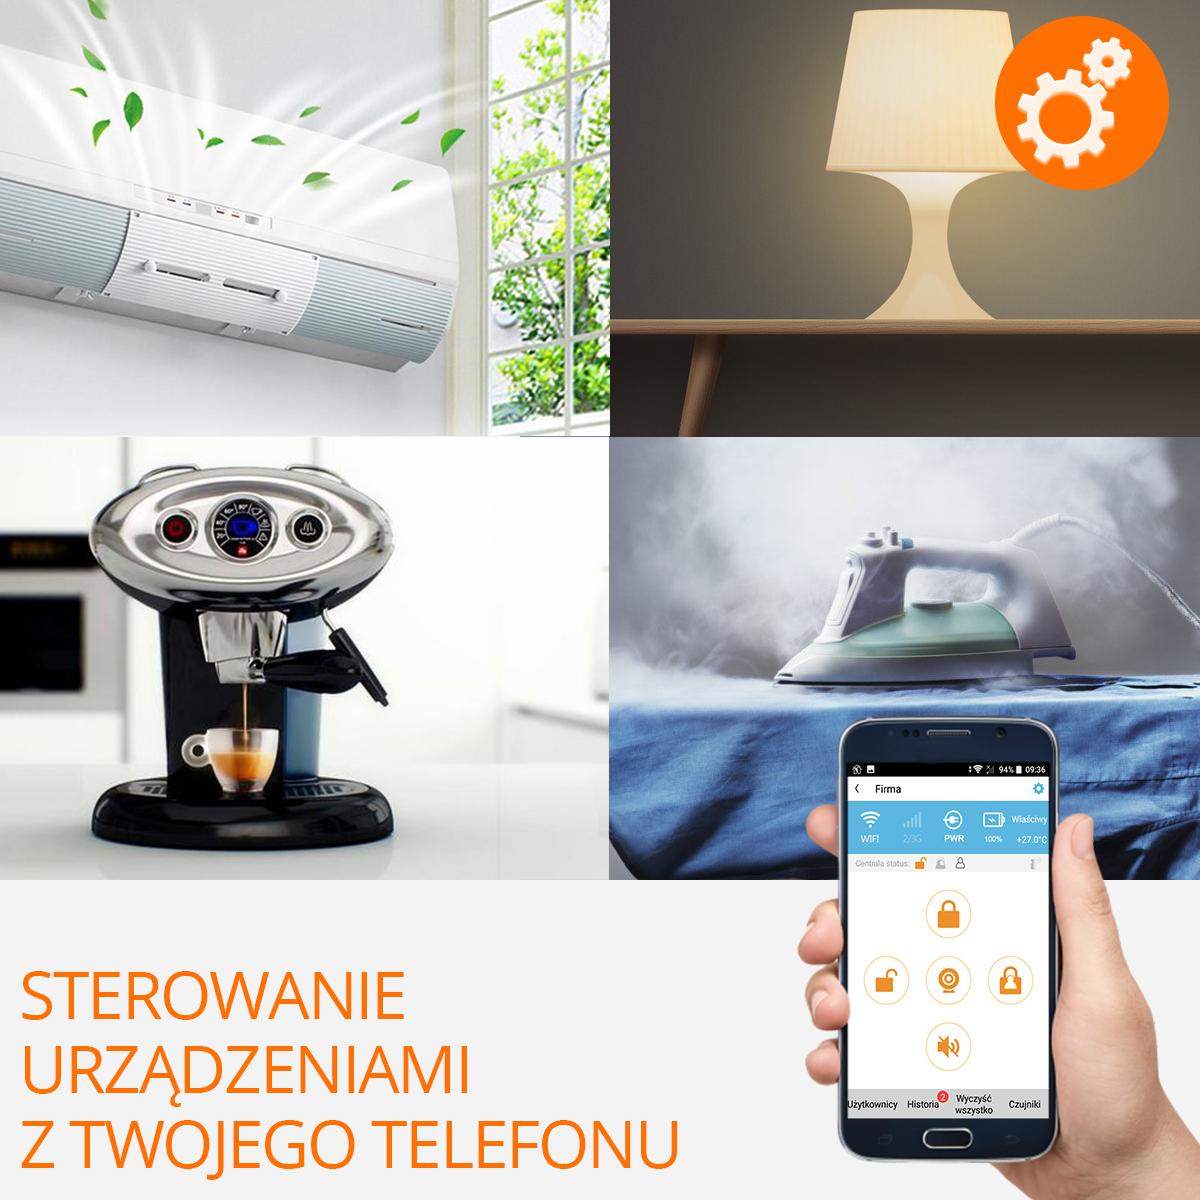 Zestaw alarmowy szeroki zasieg orllo.pl